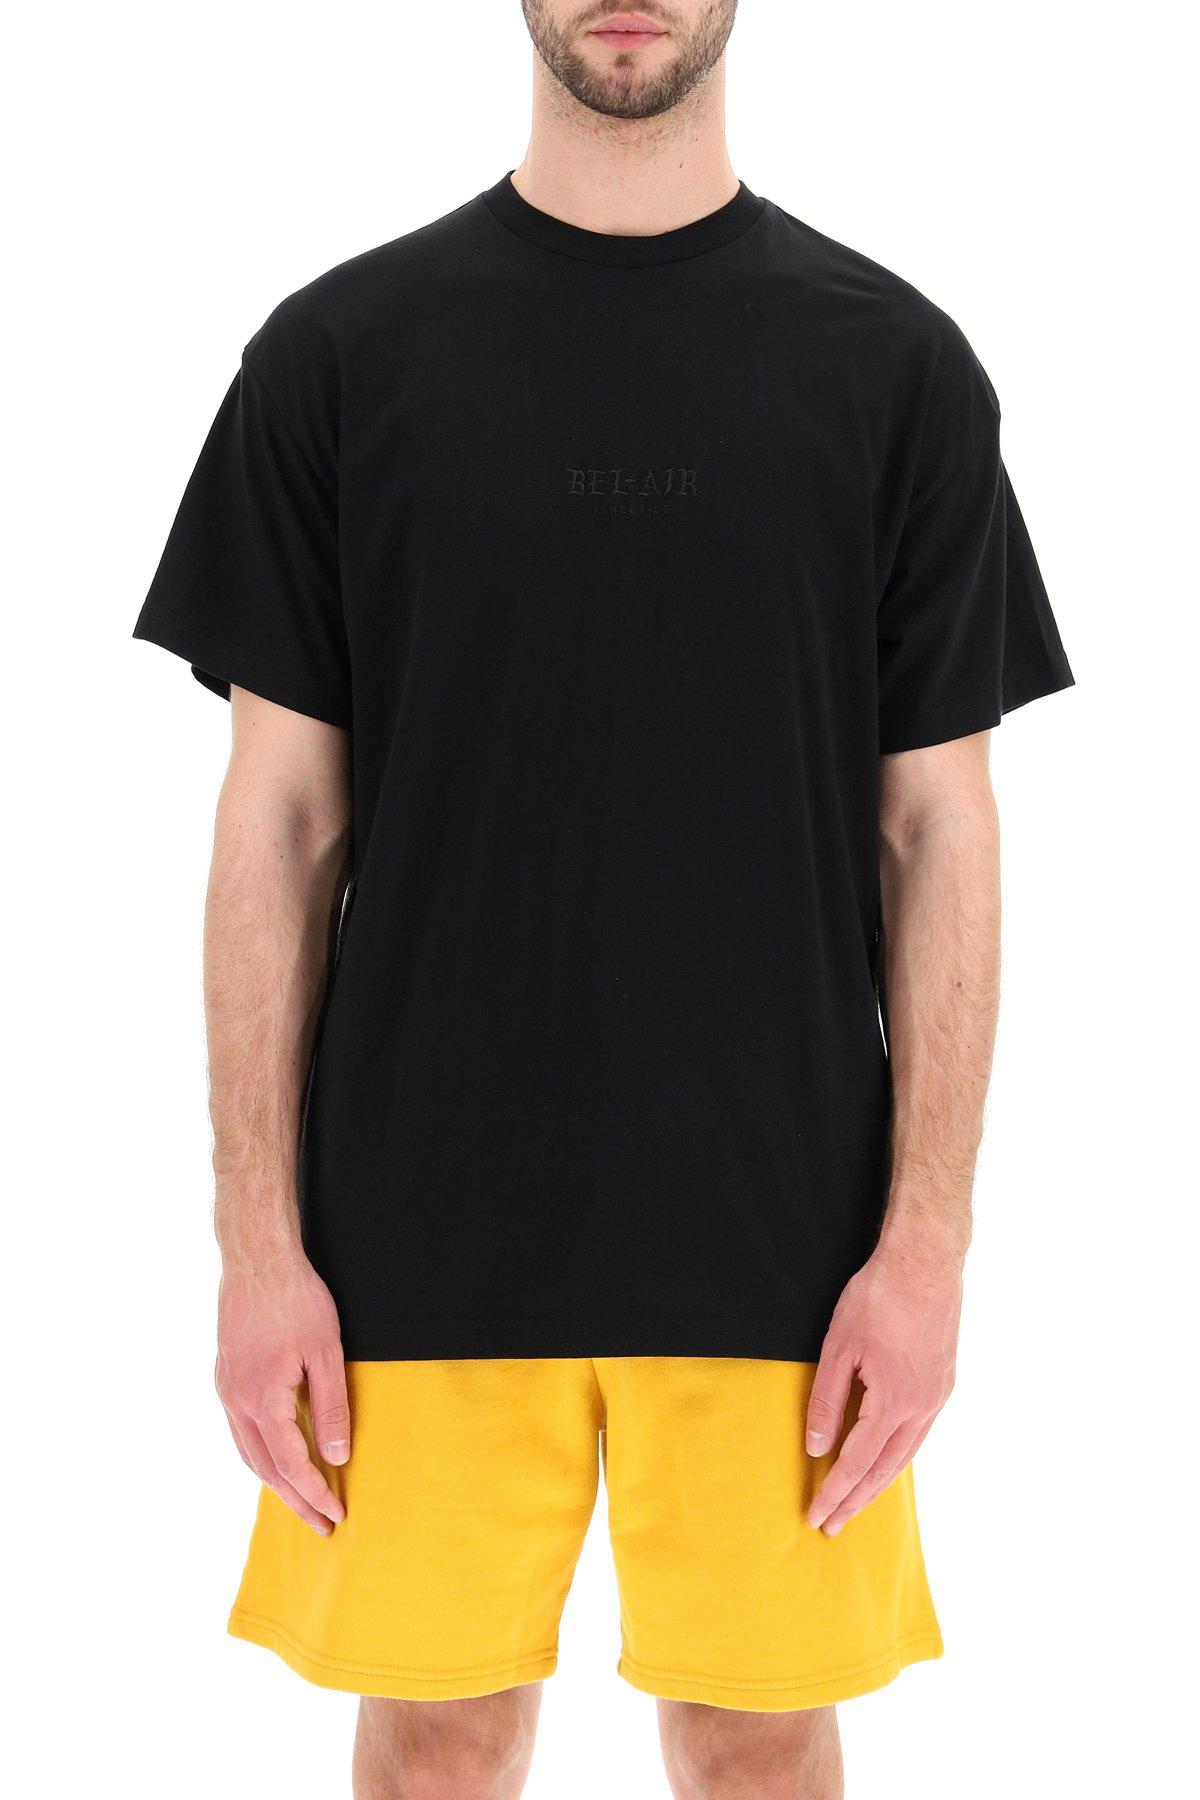 Bel-air athletics t-shirt gothic font